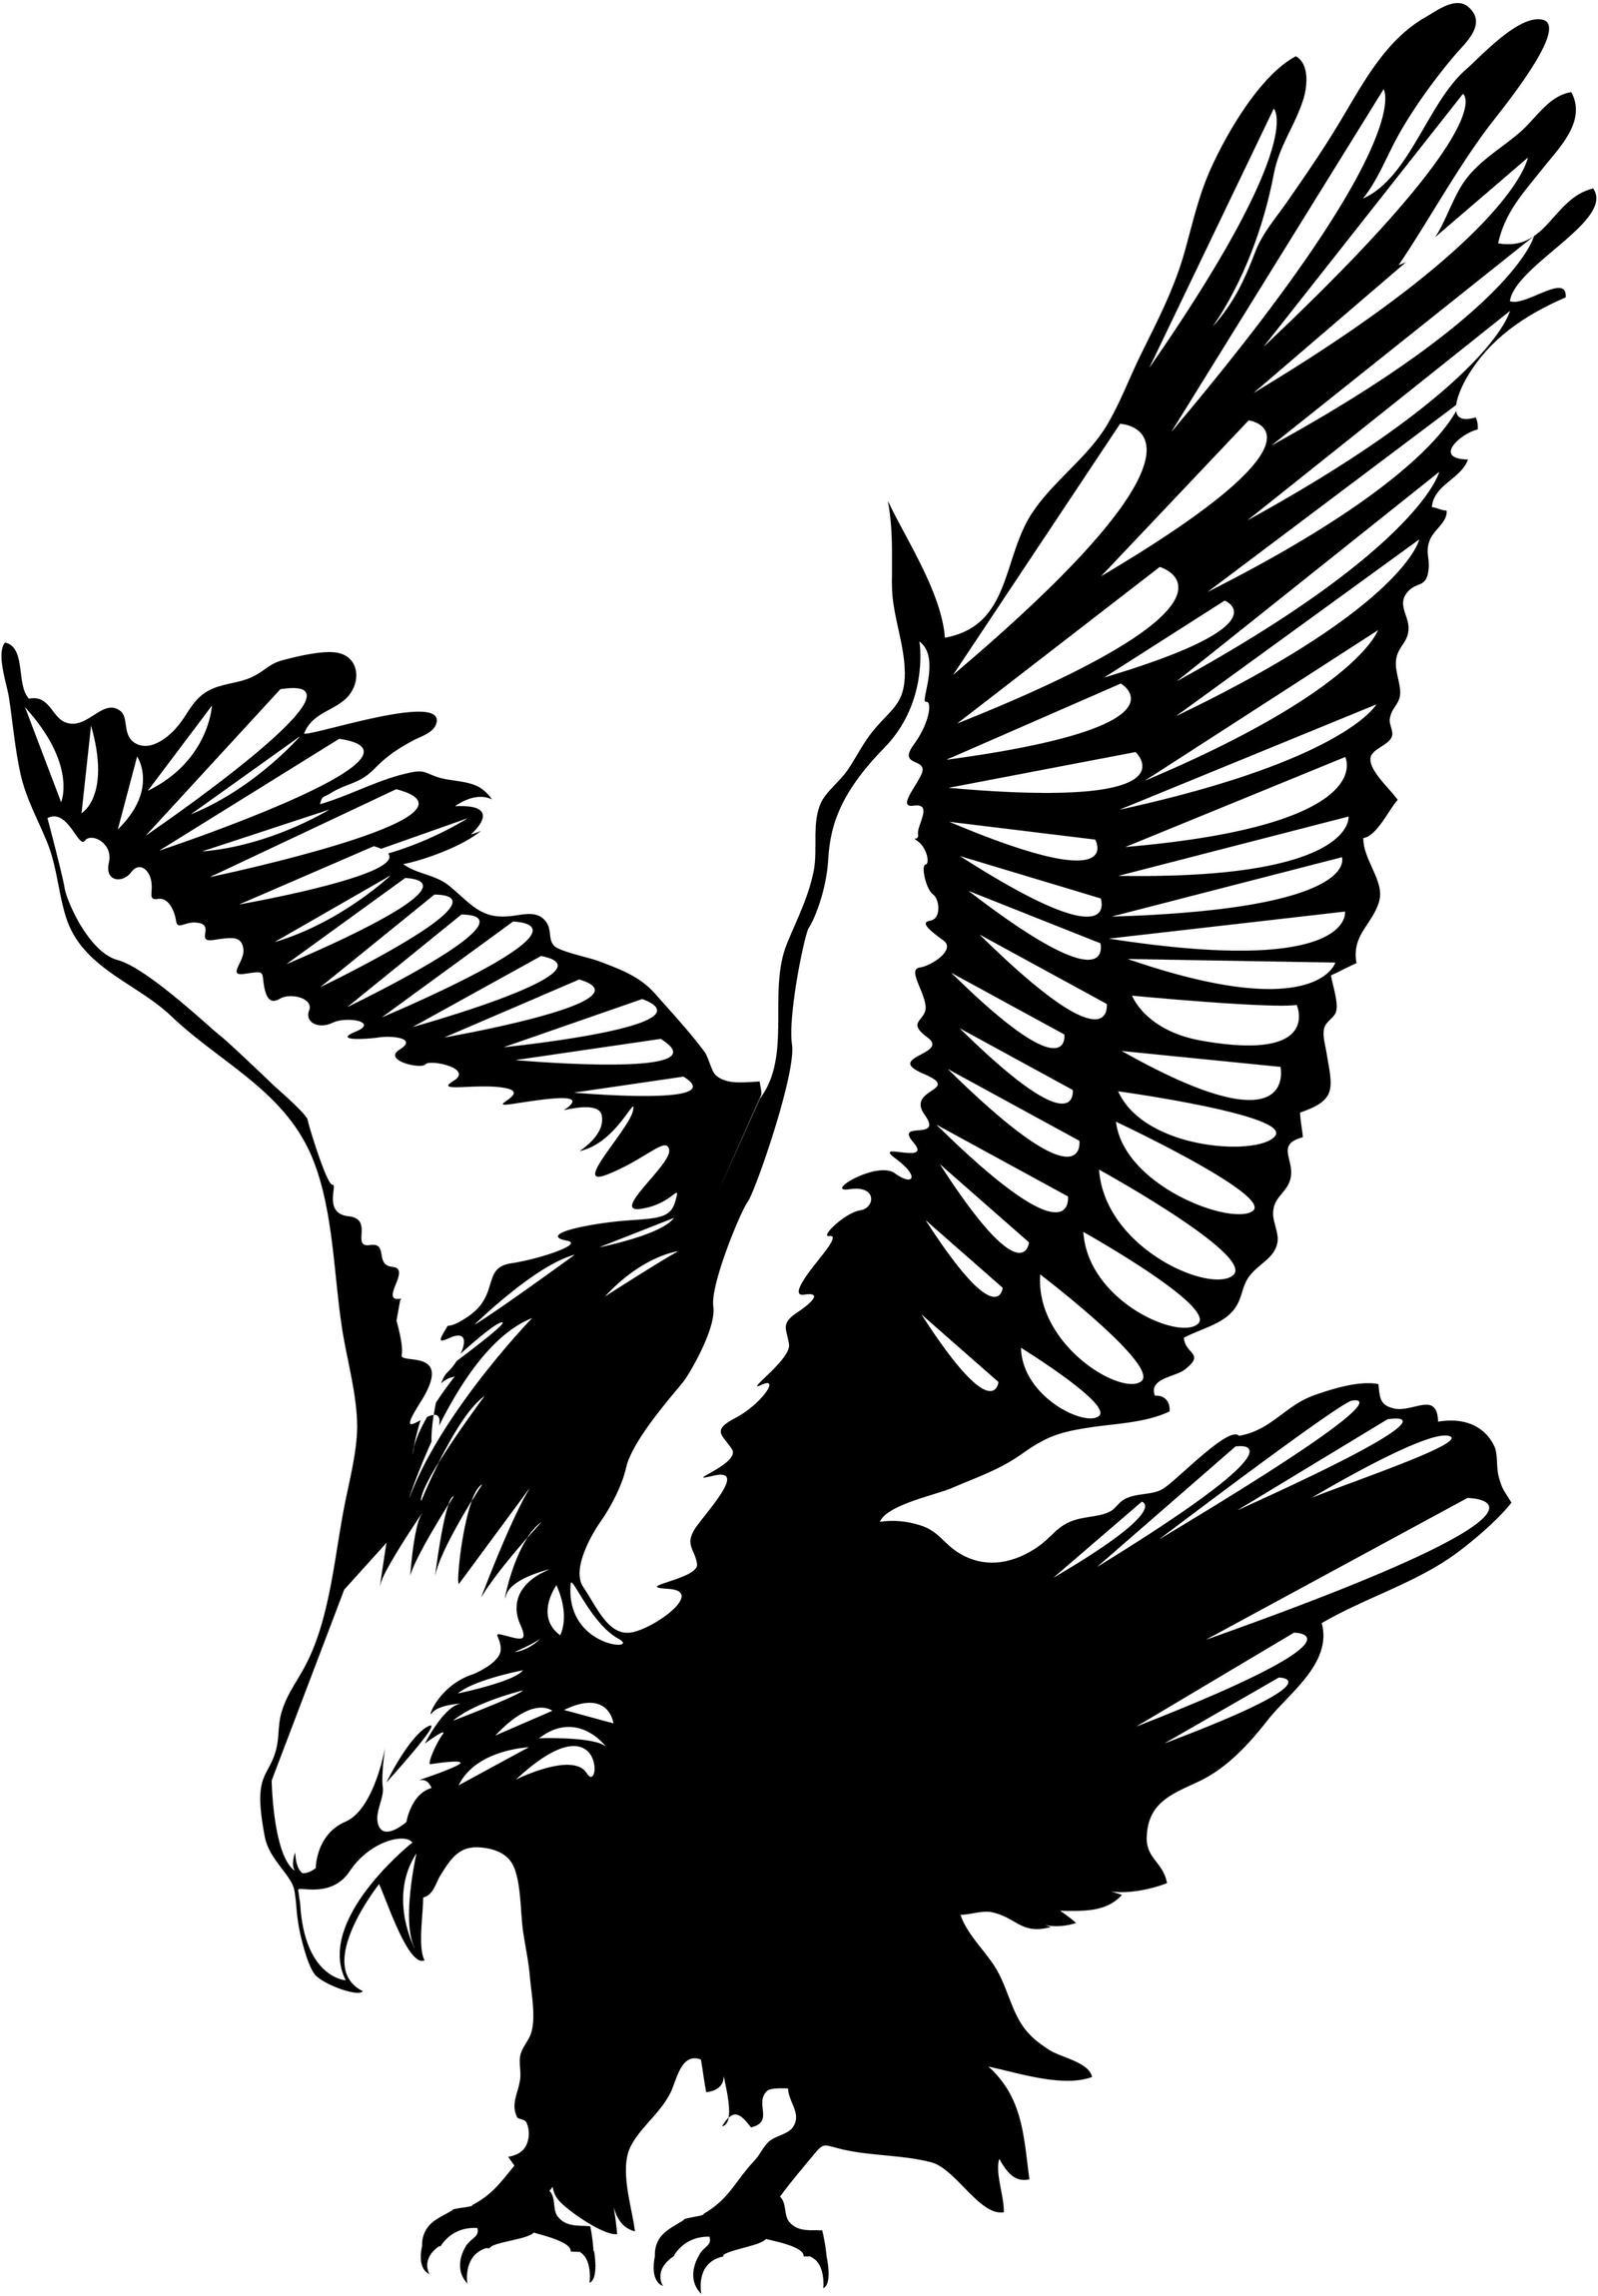 Vector Flying Eagle by macinivnw on DeviantArt